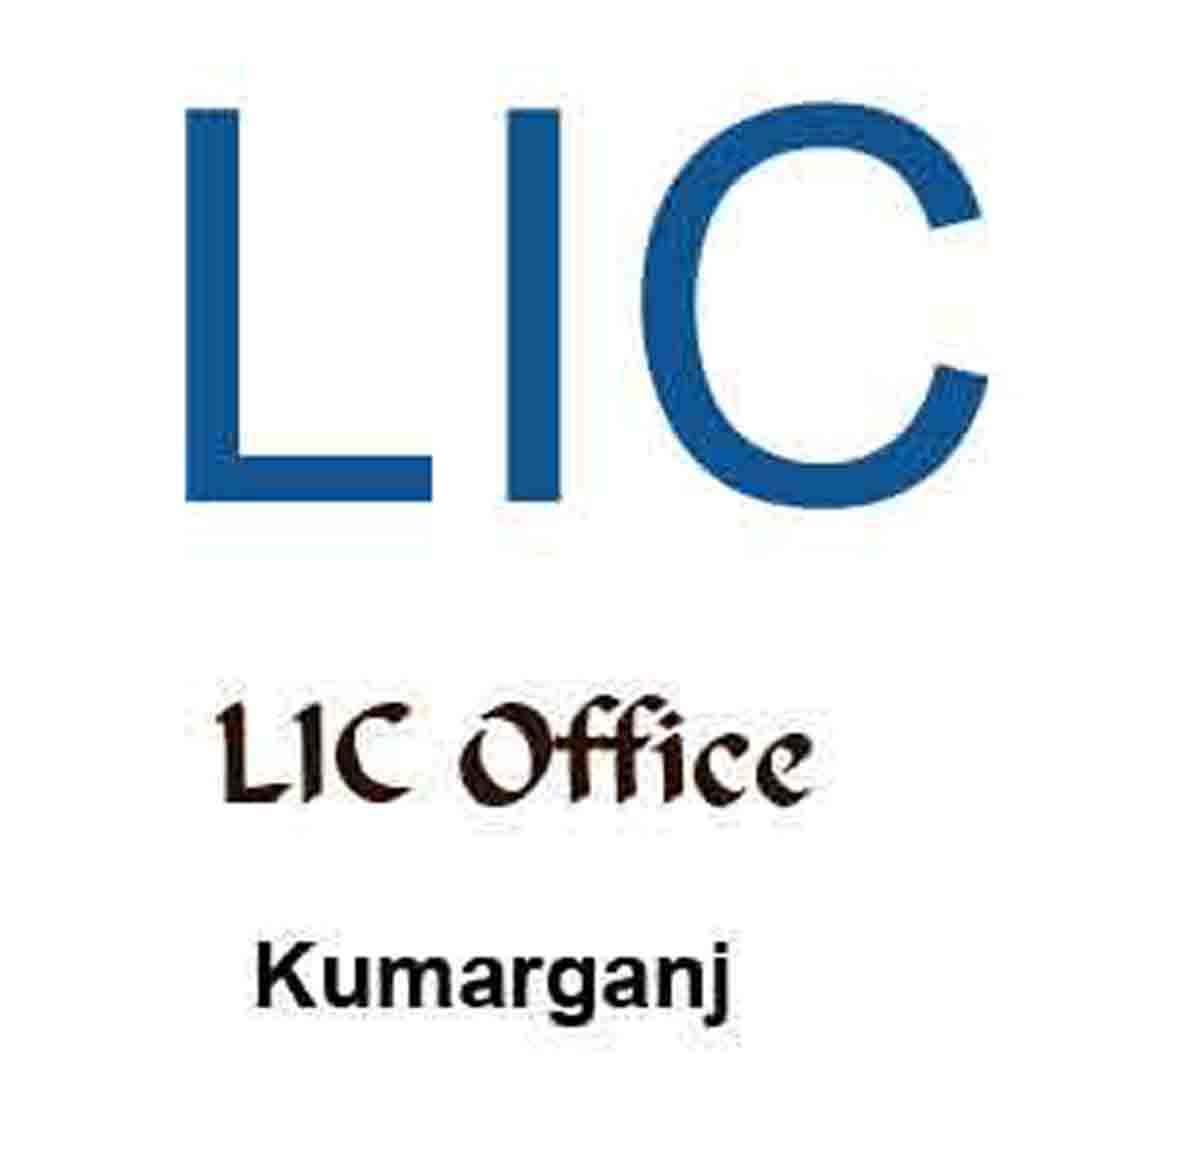 lic office kumargan